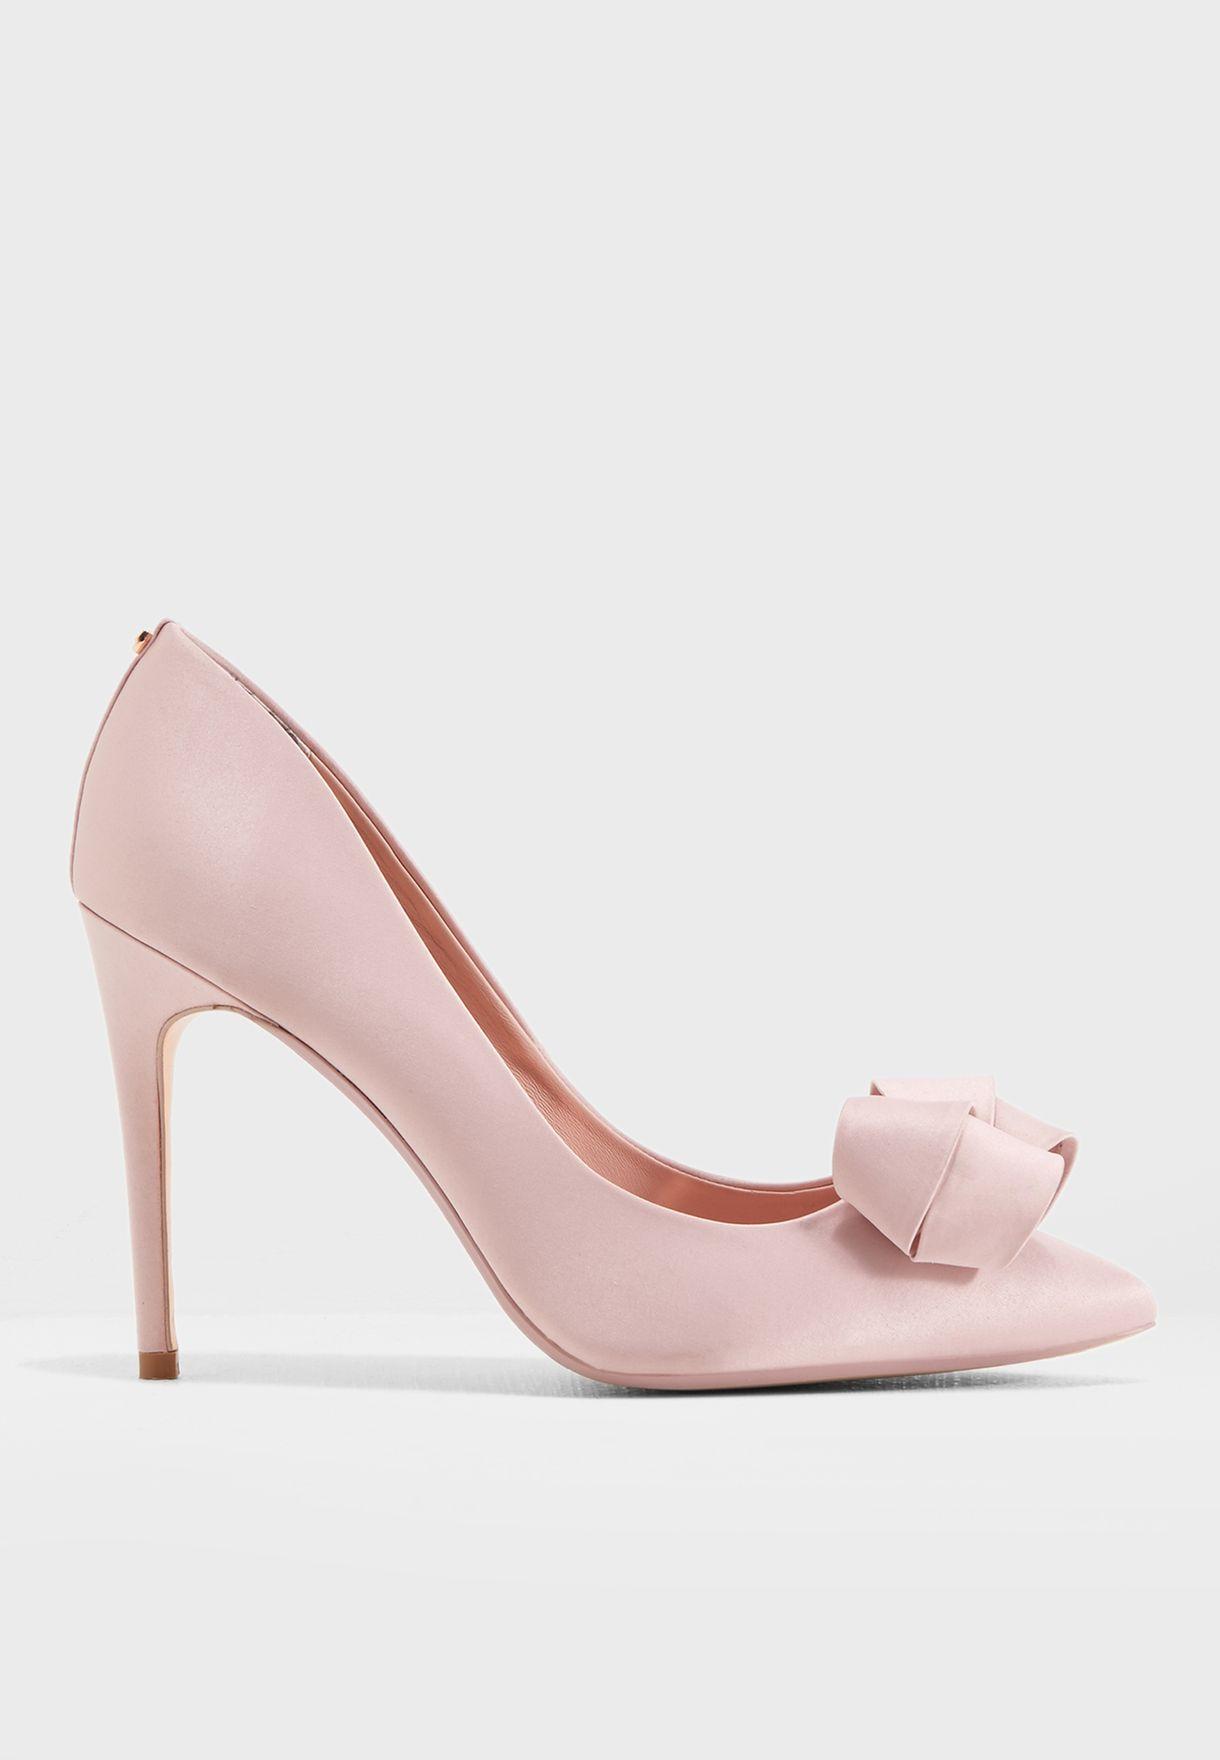 157ecc3486 Shop Ted baker pink Skalett Bow Pump 917272 for Women in UAE ...